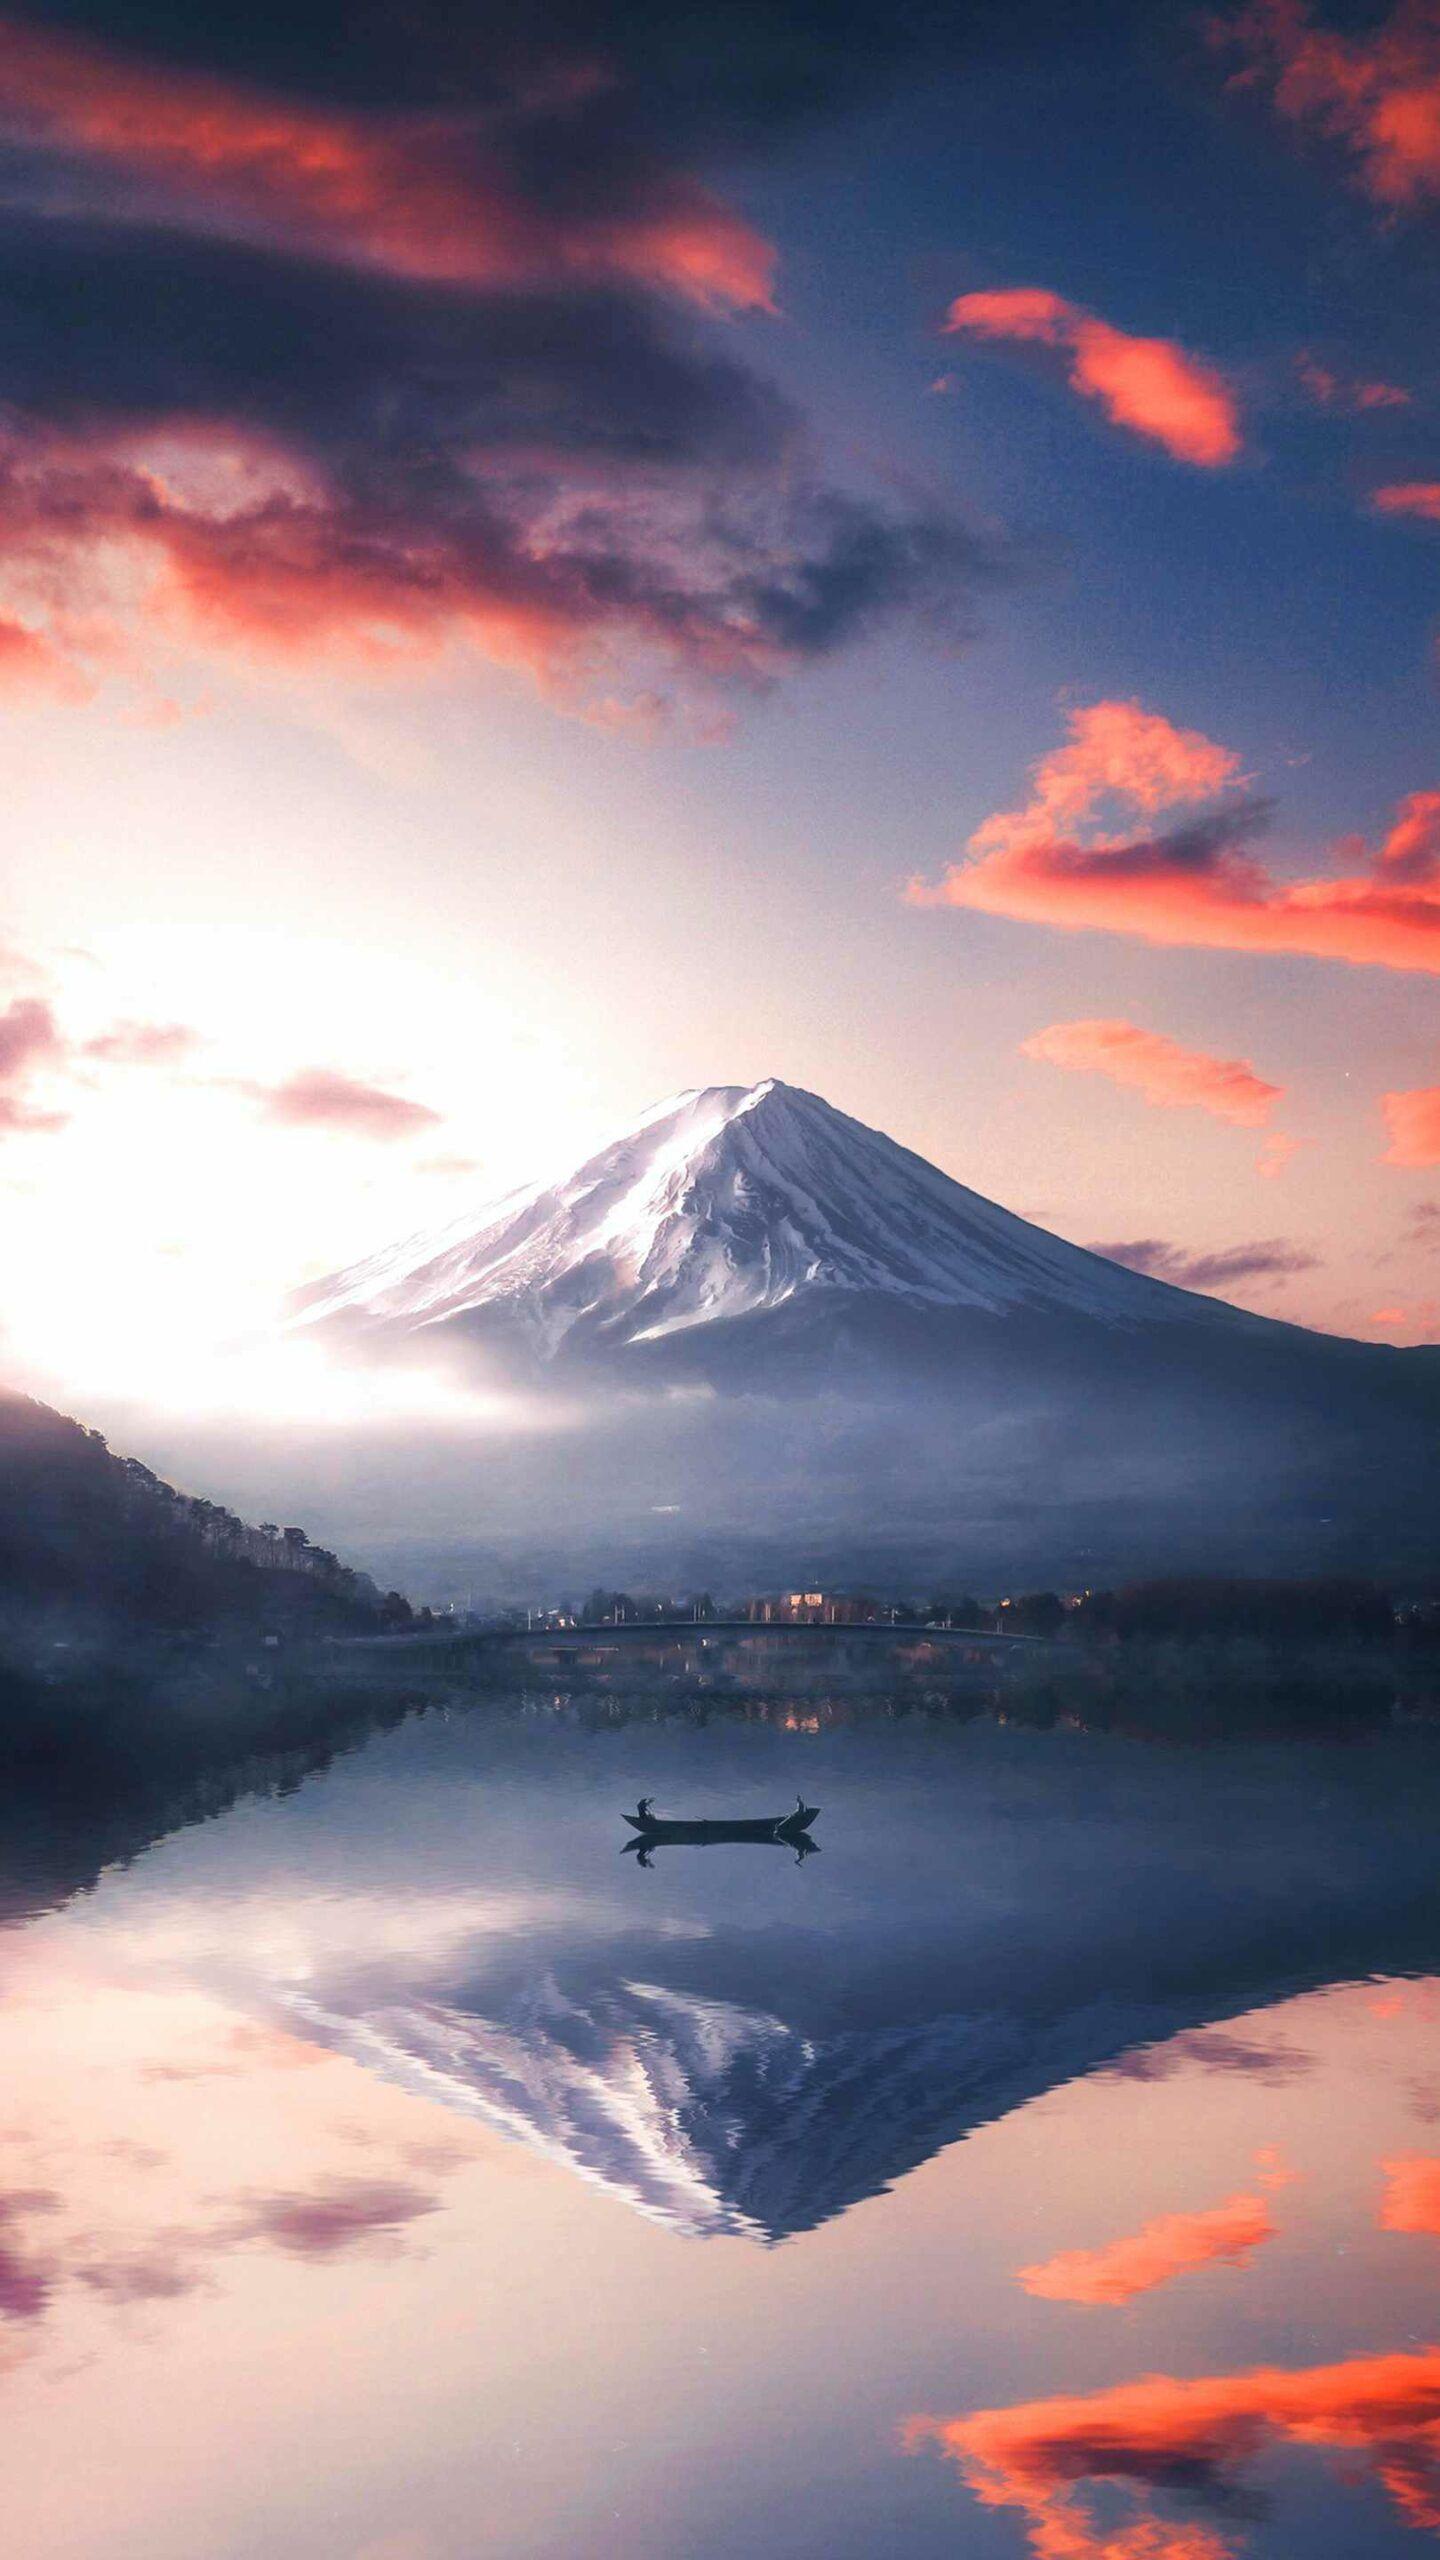 Mount Fuji Adventures IPhone Wallpaper in 2020 (With